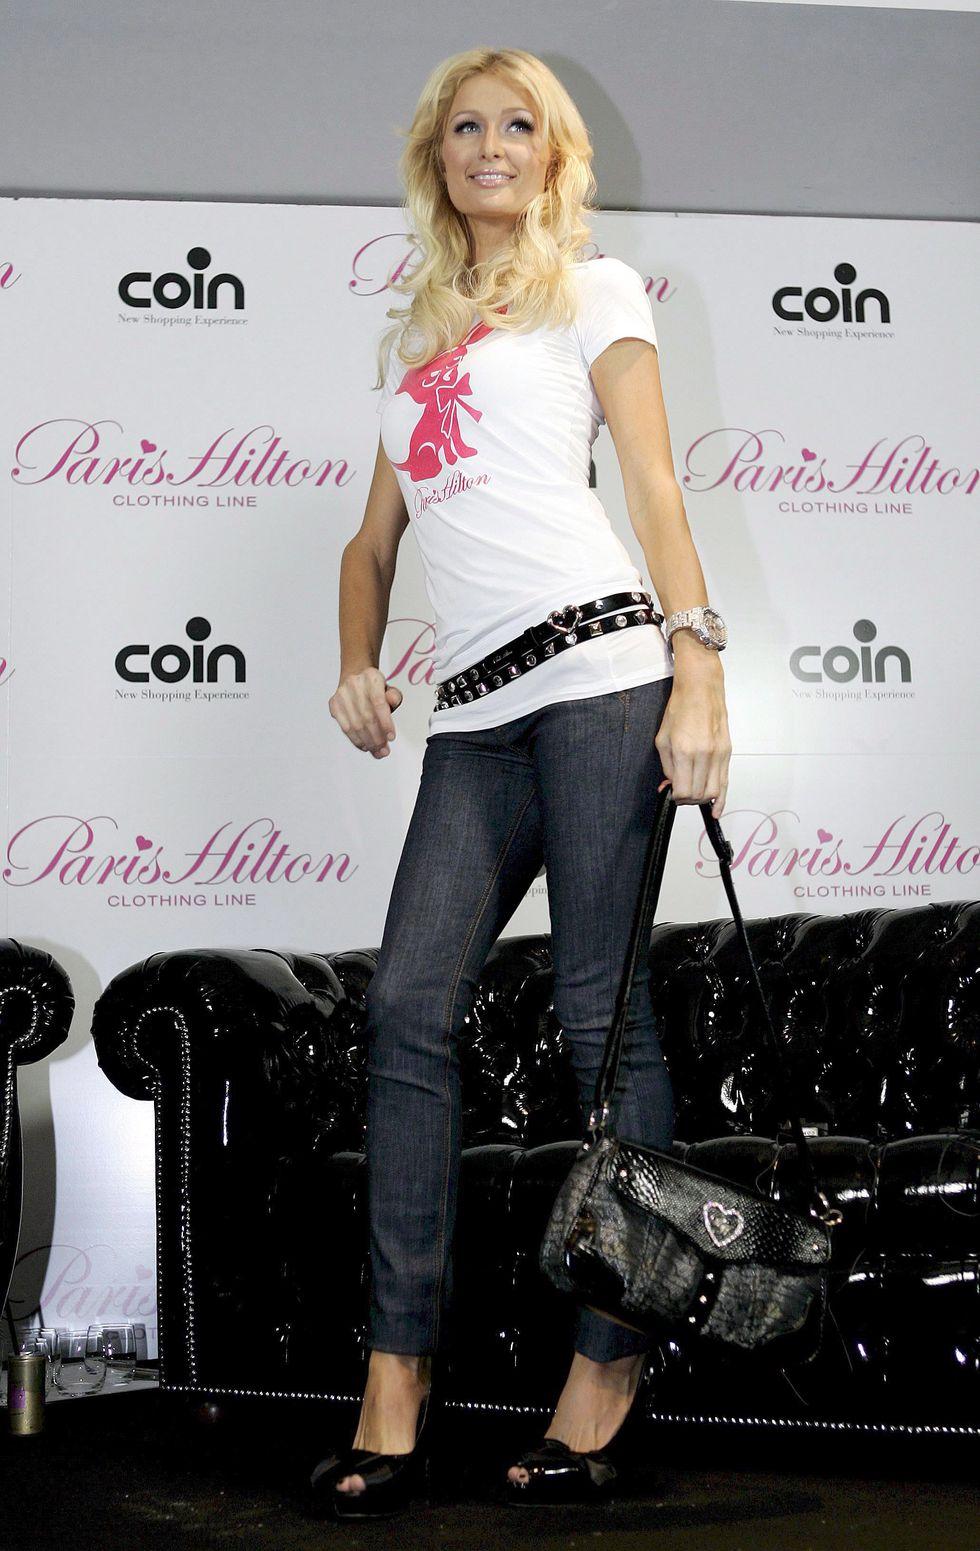 paris-hilton-paris-hilton-clothing-line-european-launch-in-milan-18